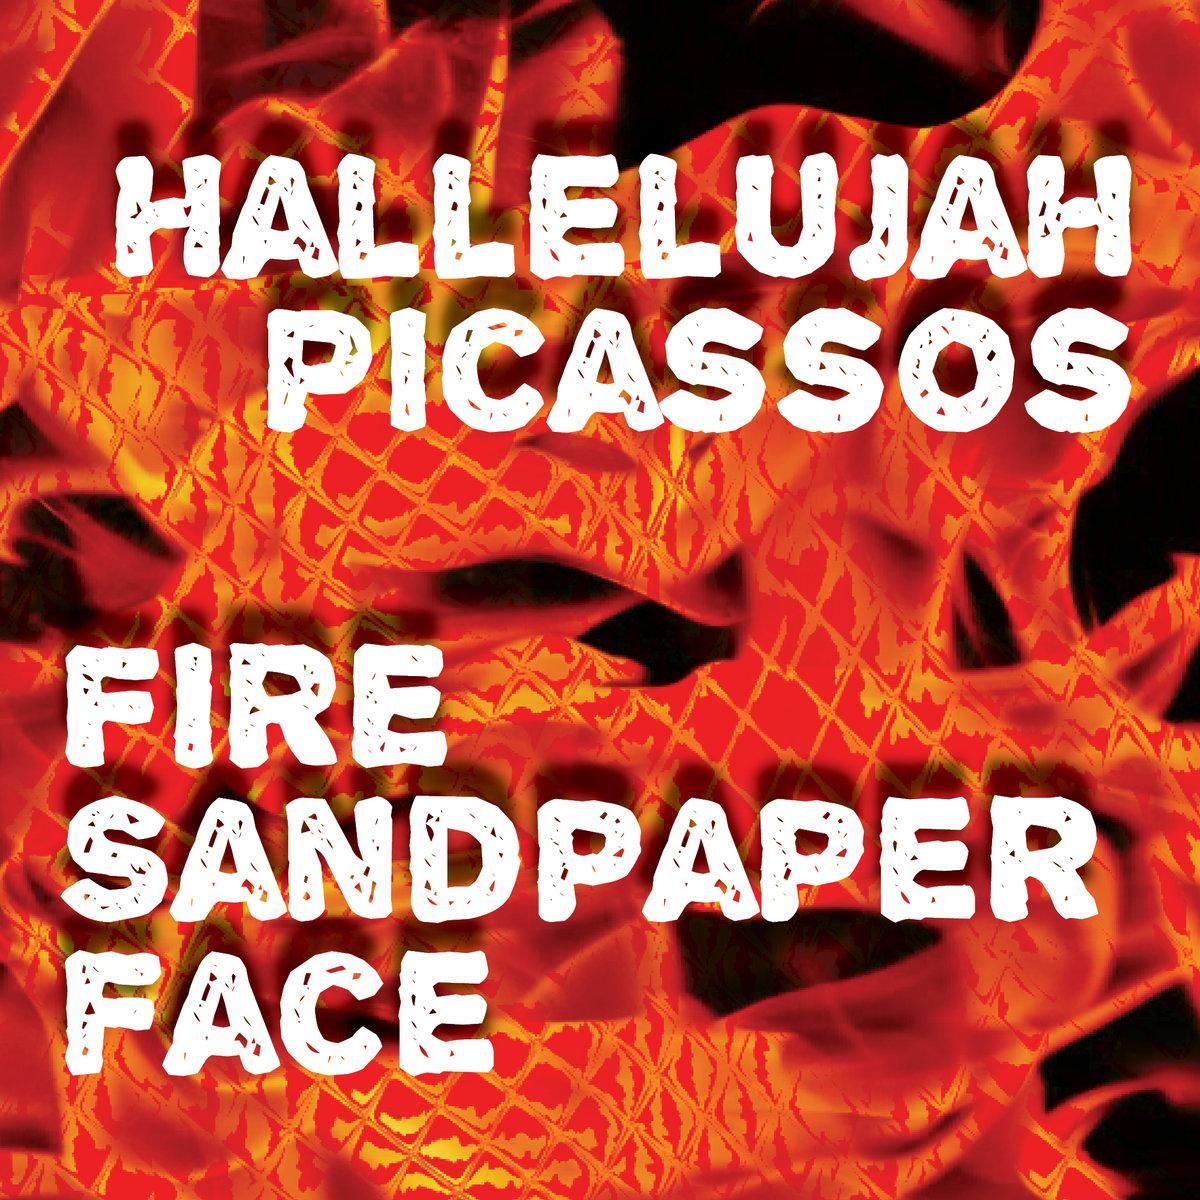 Fire Sandpapaer Face